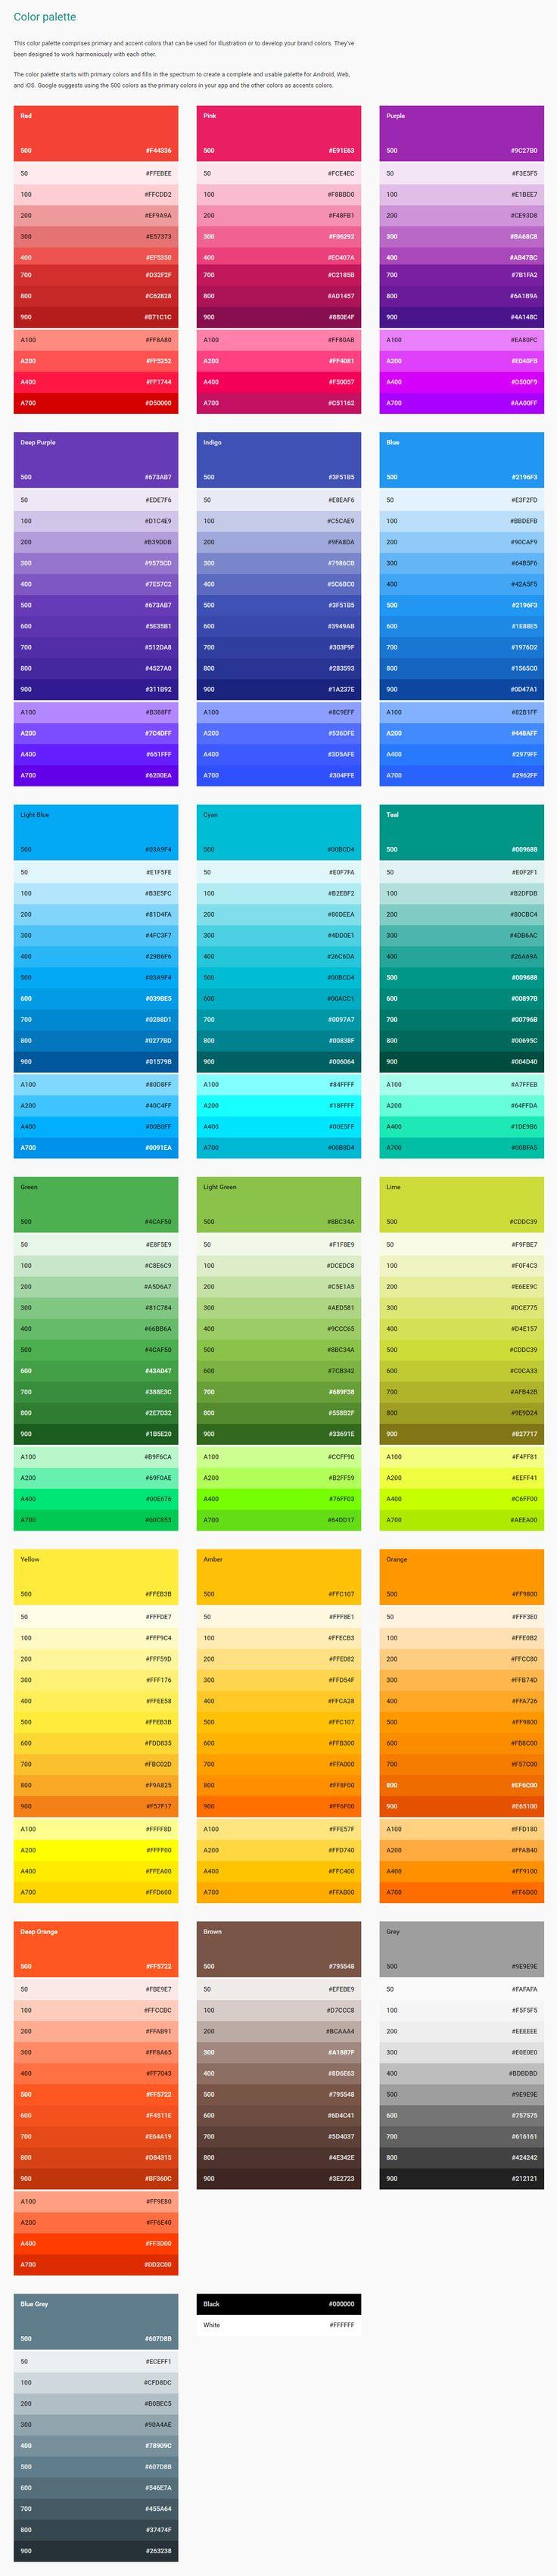 Google Material Design - Color styleguide